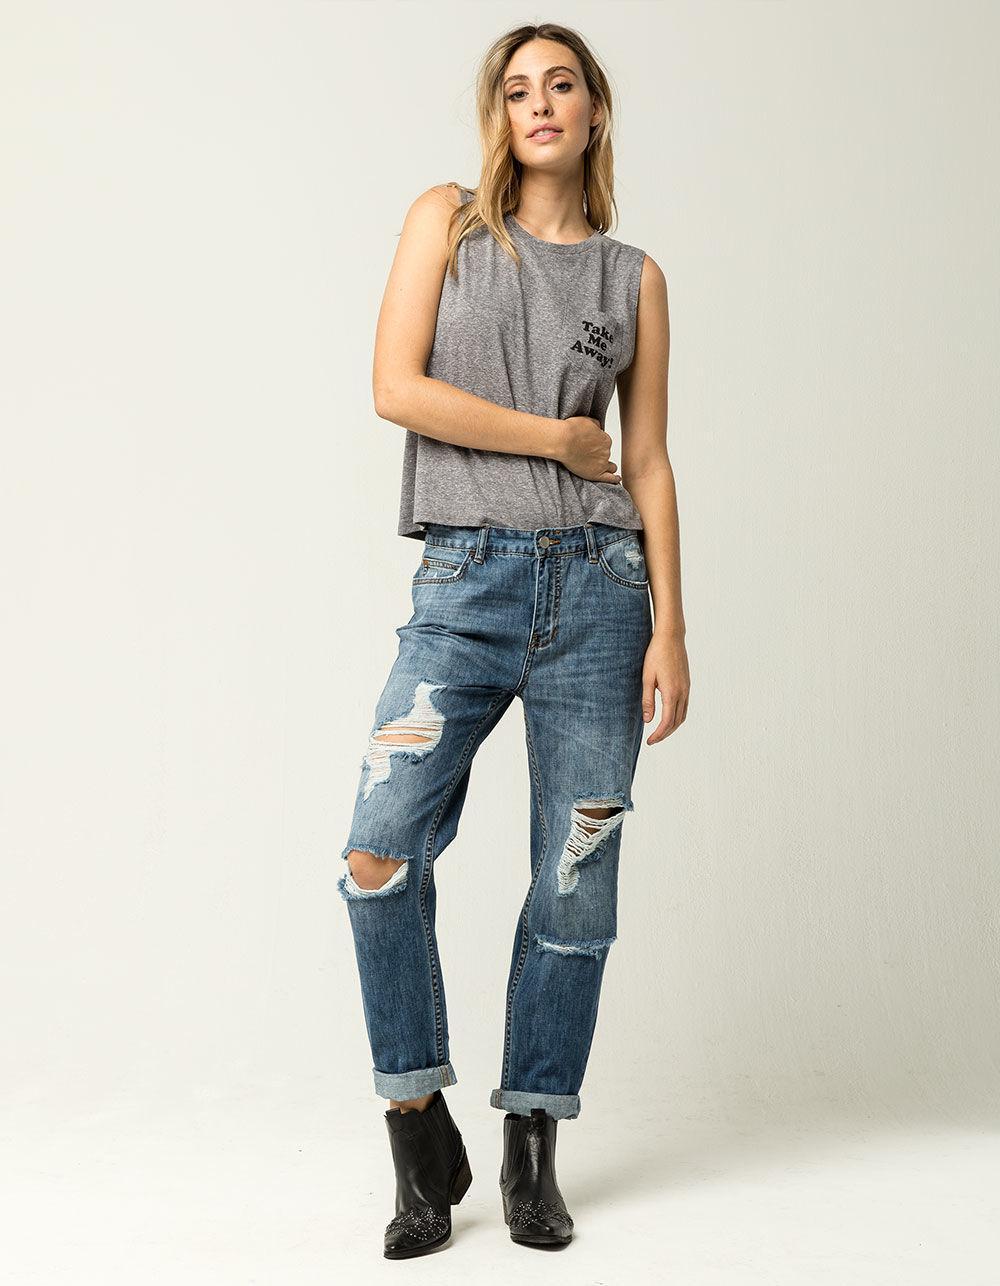 3 Ways to Style Boyfriend Jeans by Blair Staky   The Fox & She